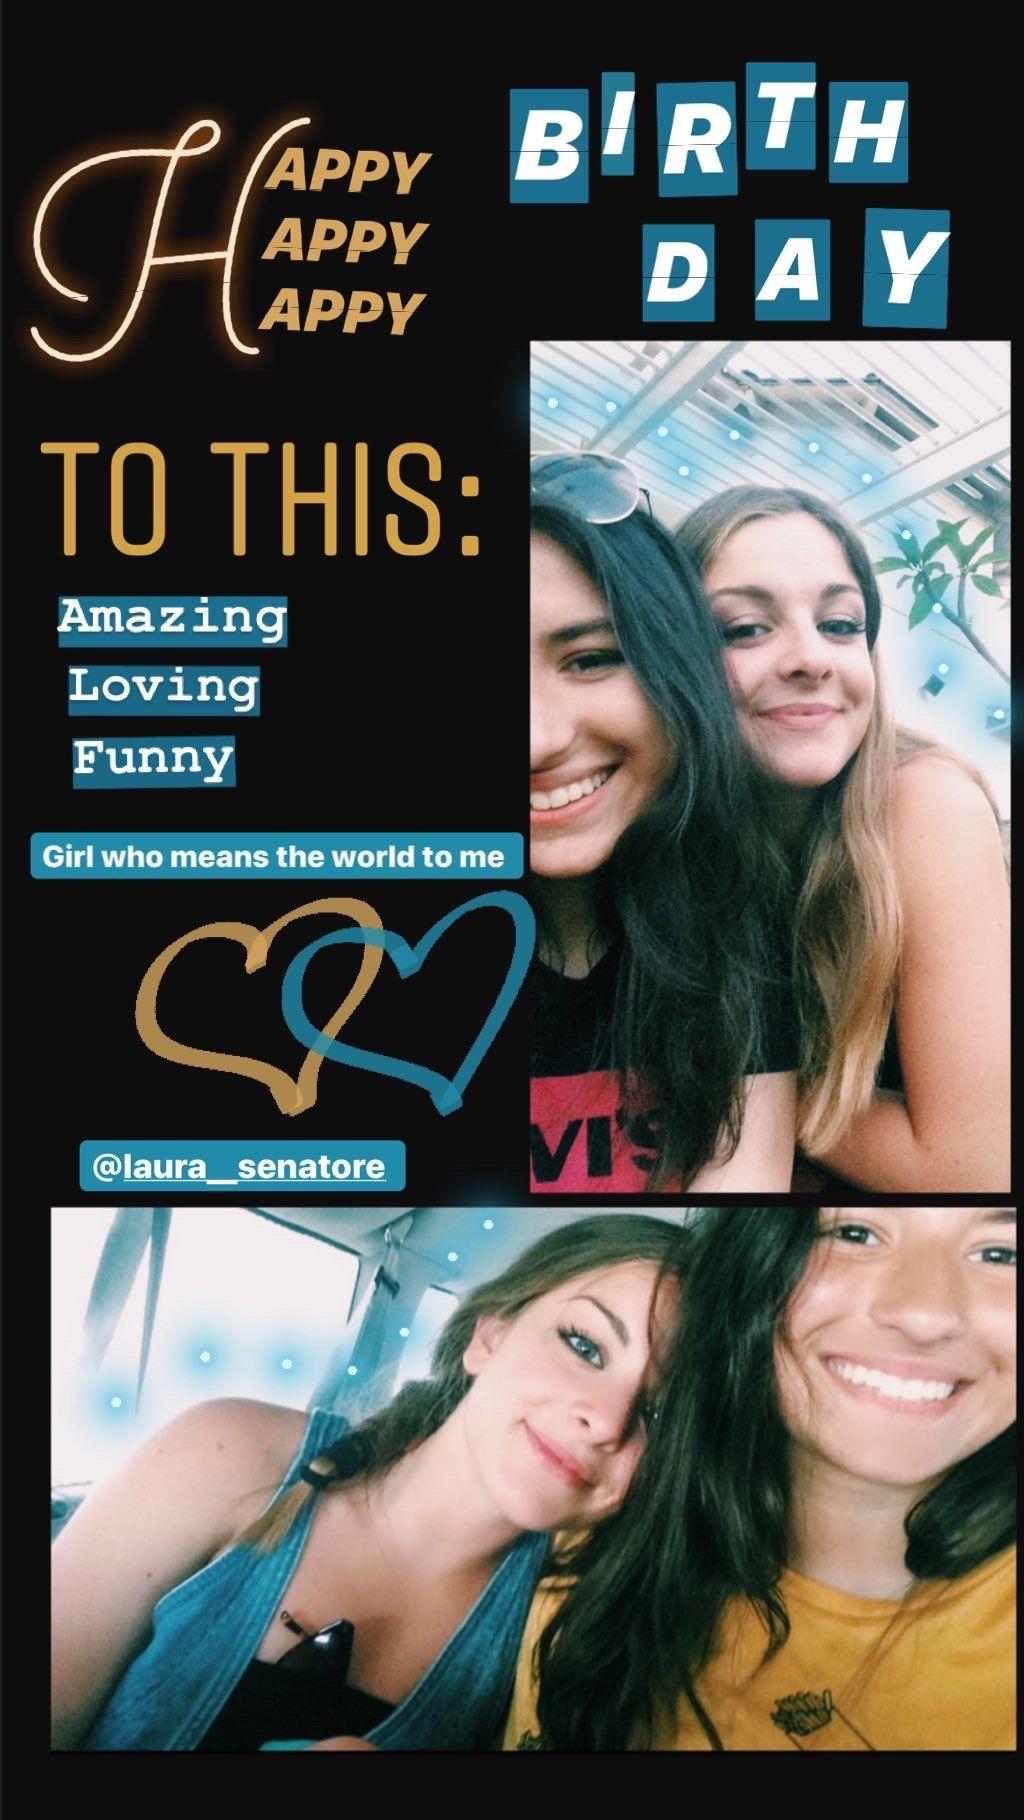 Livia Bortot Birthday Post Instagram Instagram Story Ideas Selfie Ideas Instagram How to wish birthday on instagram story. pinterest